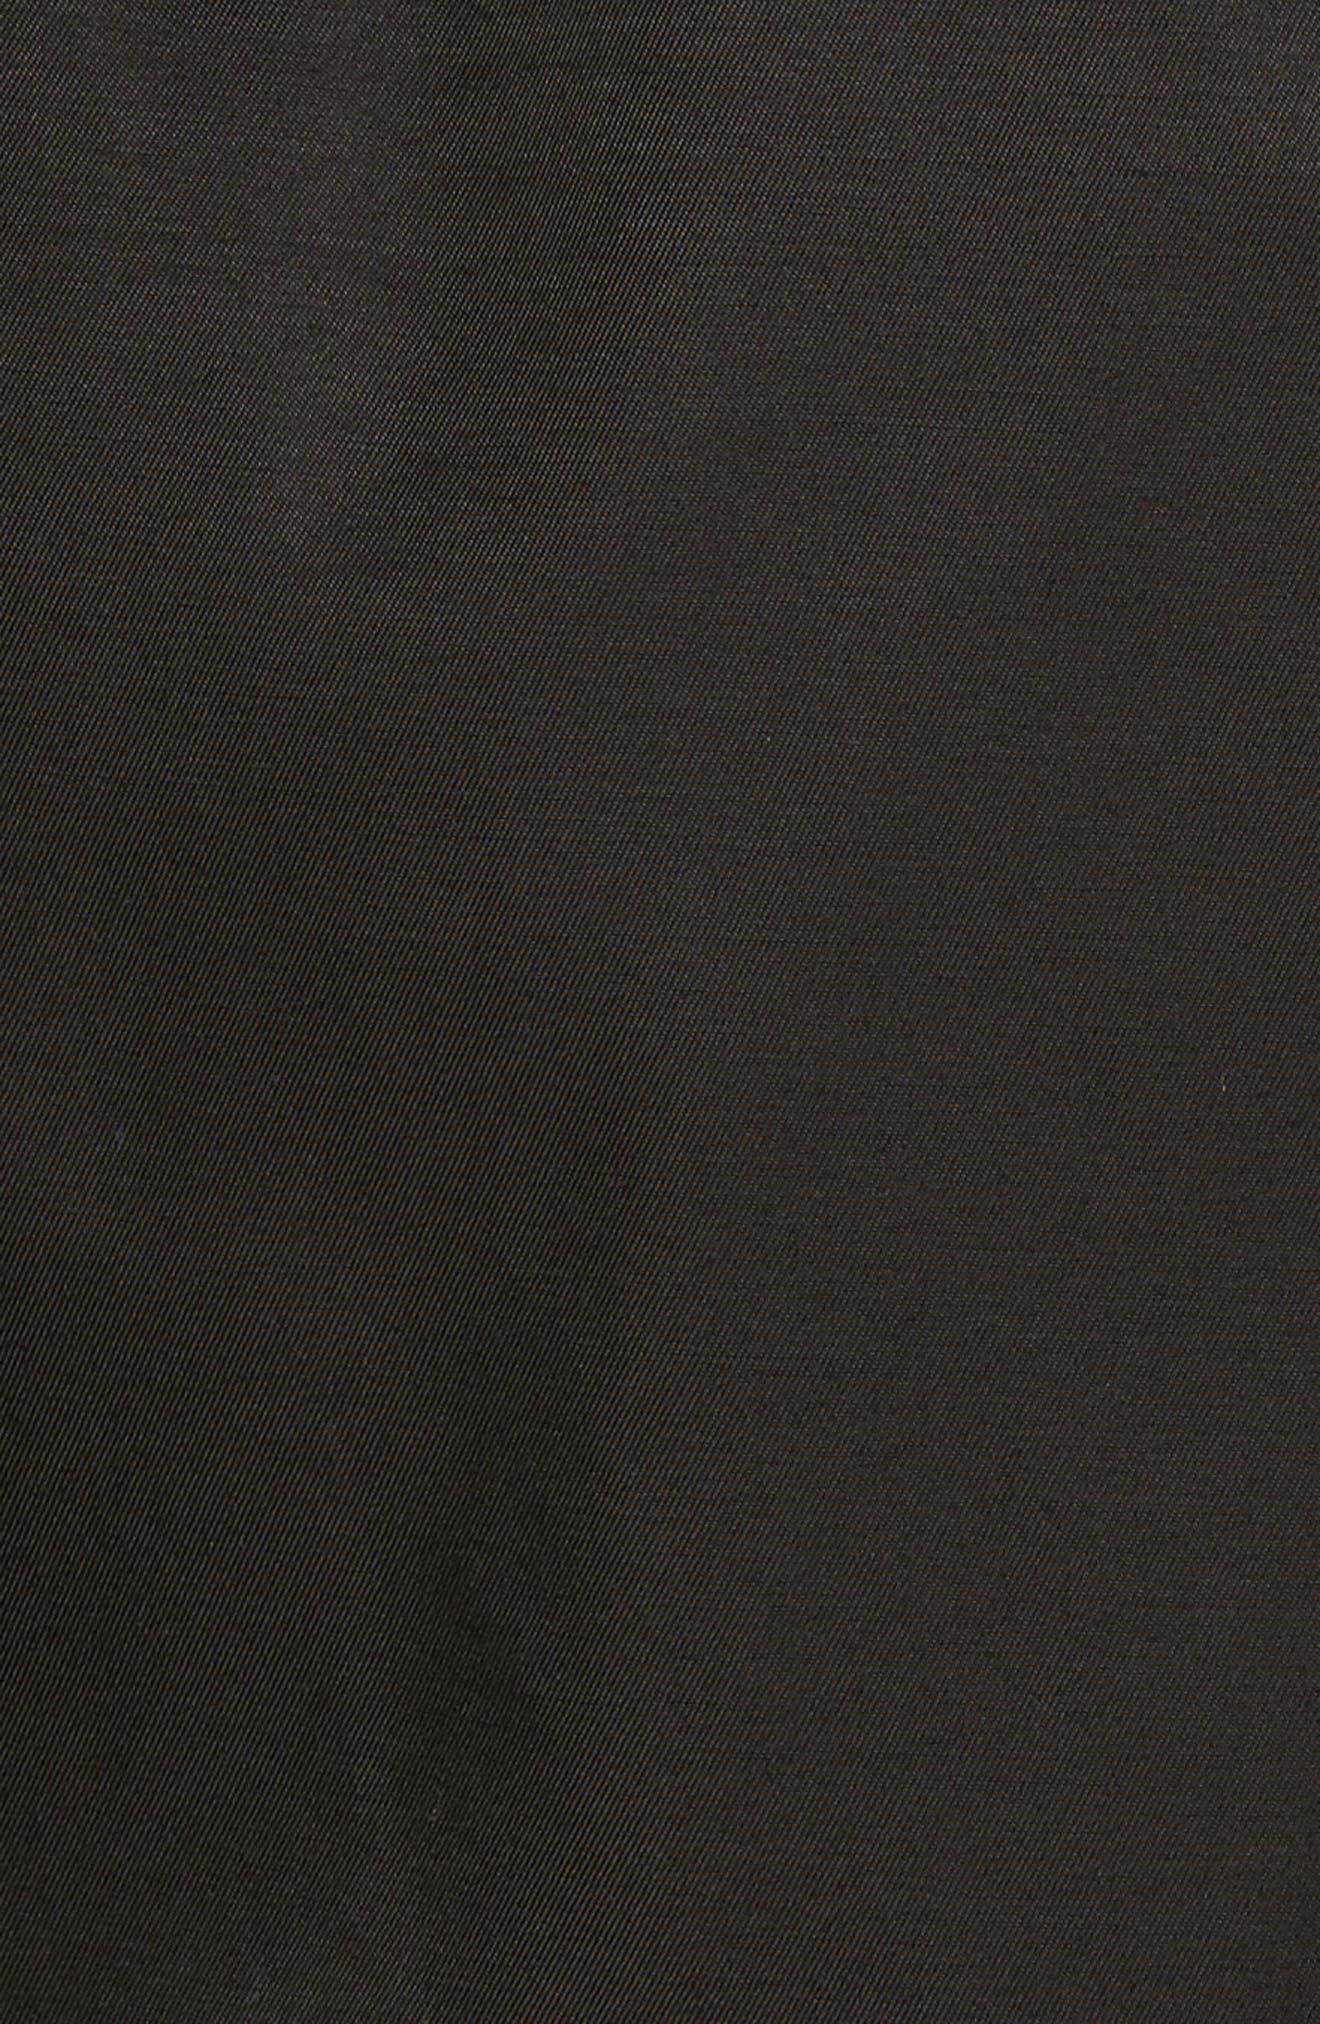 Trench Coat,                             Alternate thumbnail 5, color,                             Black